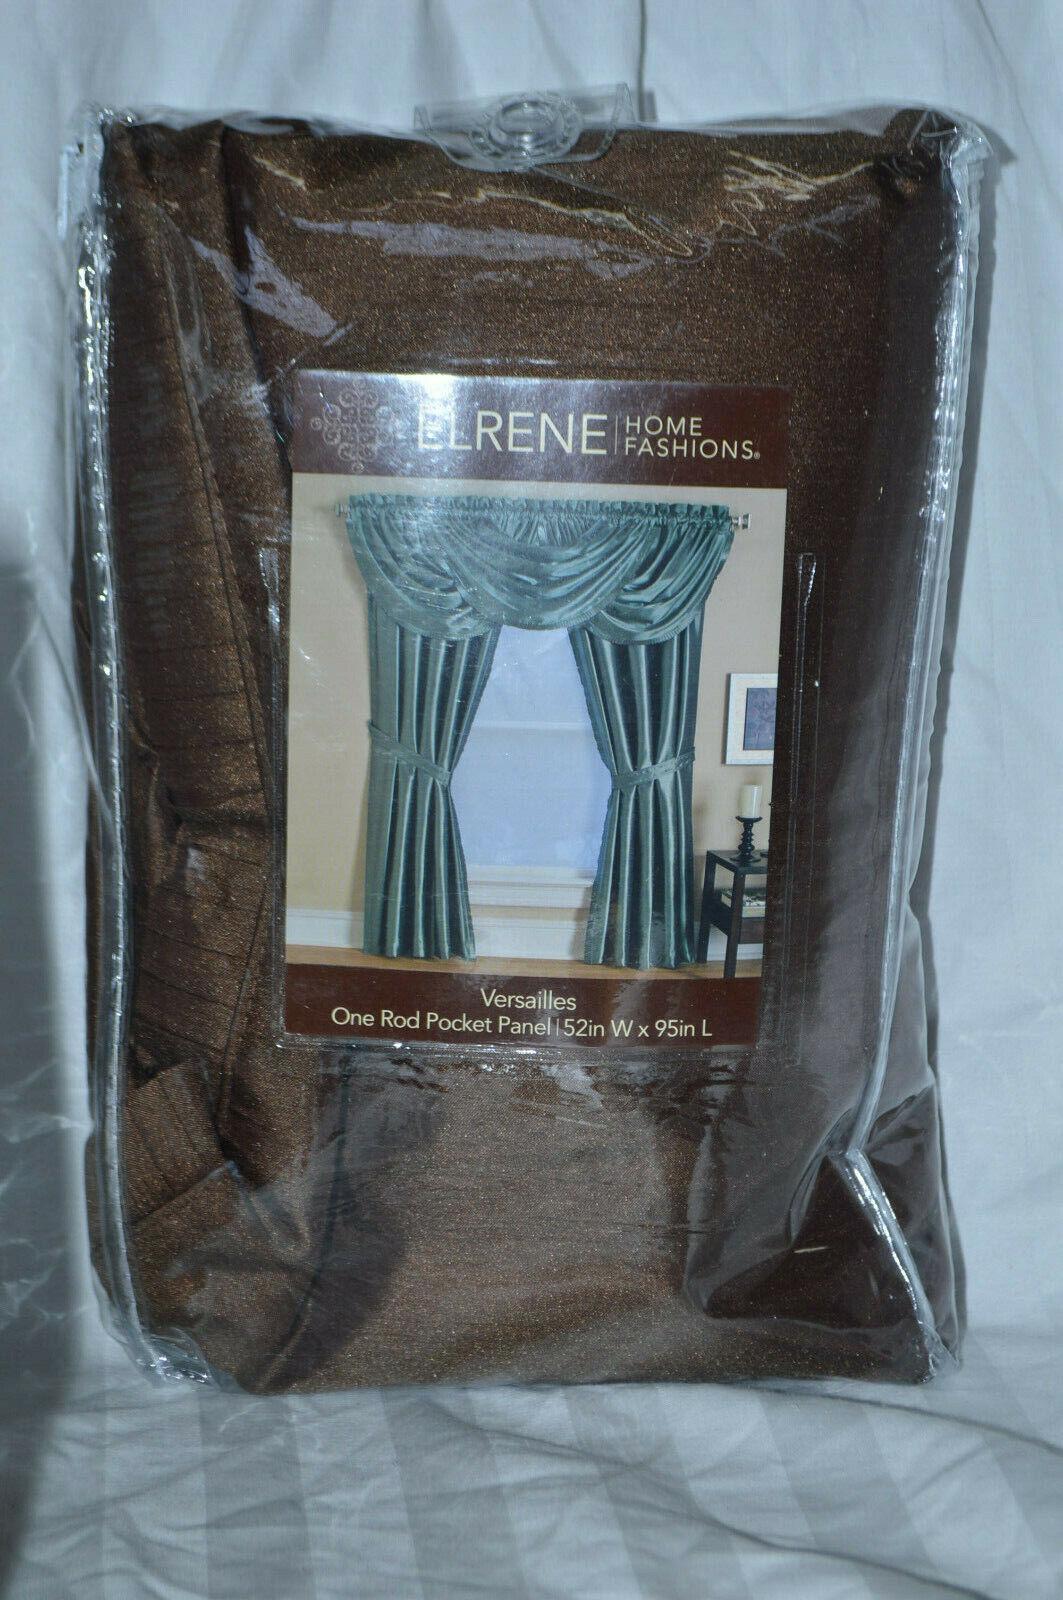 ELRENE Home Fashions Versailles Rod Pocket Panel Curtain 52i